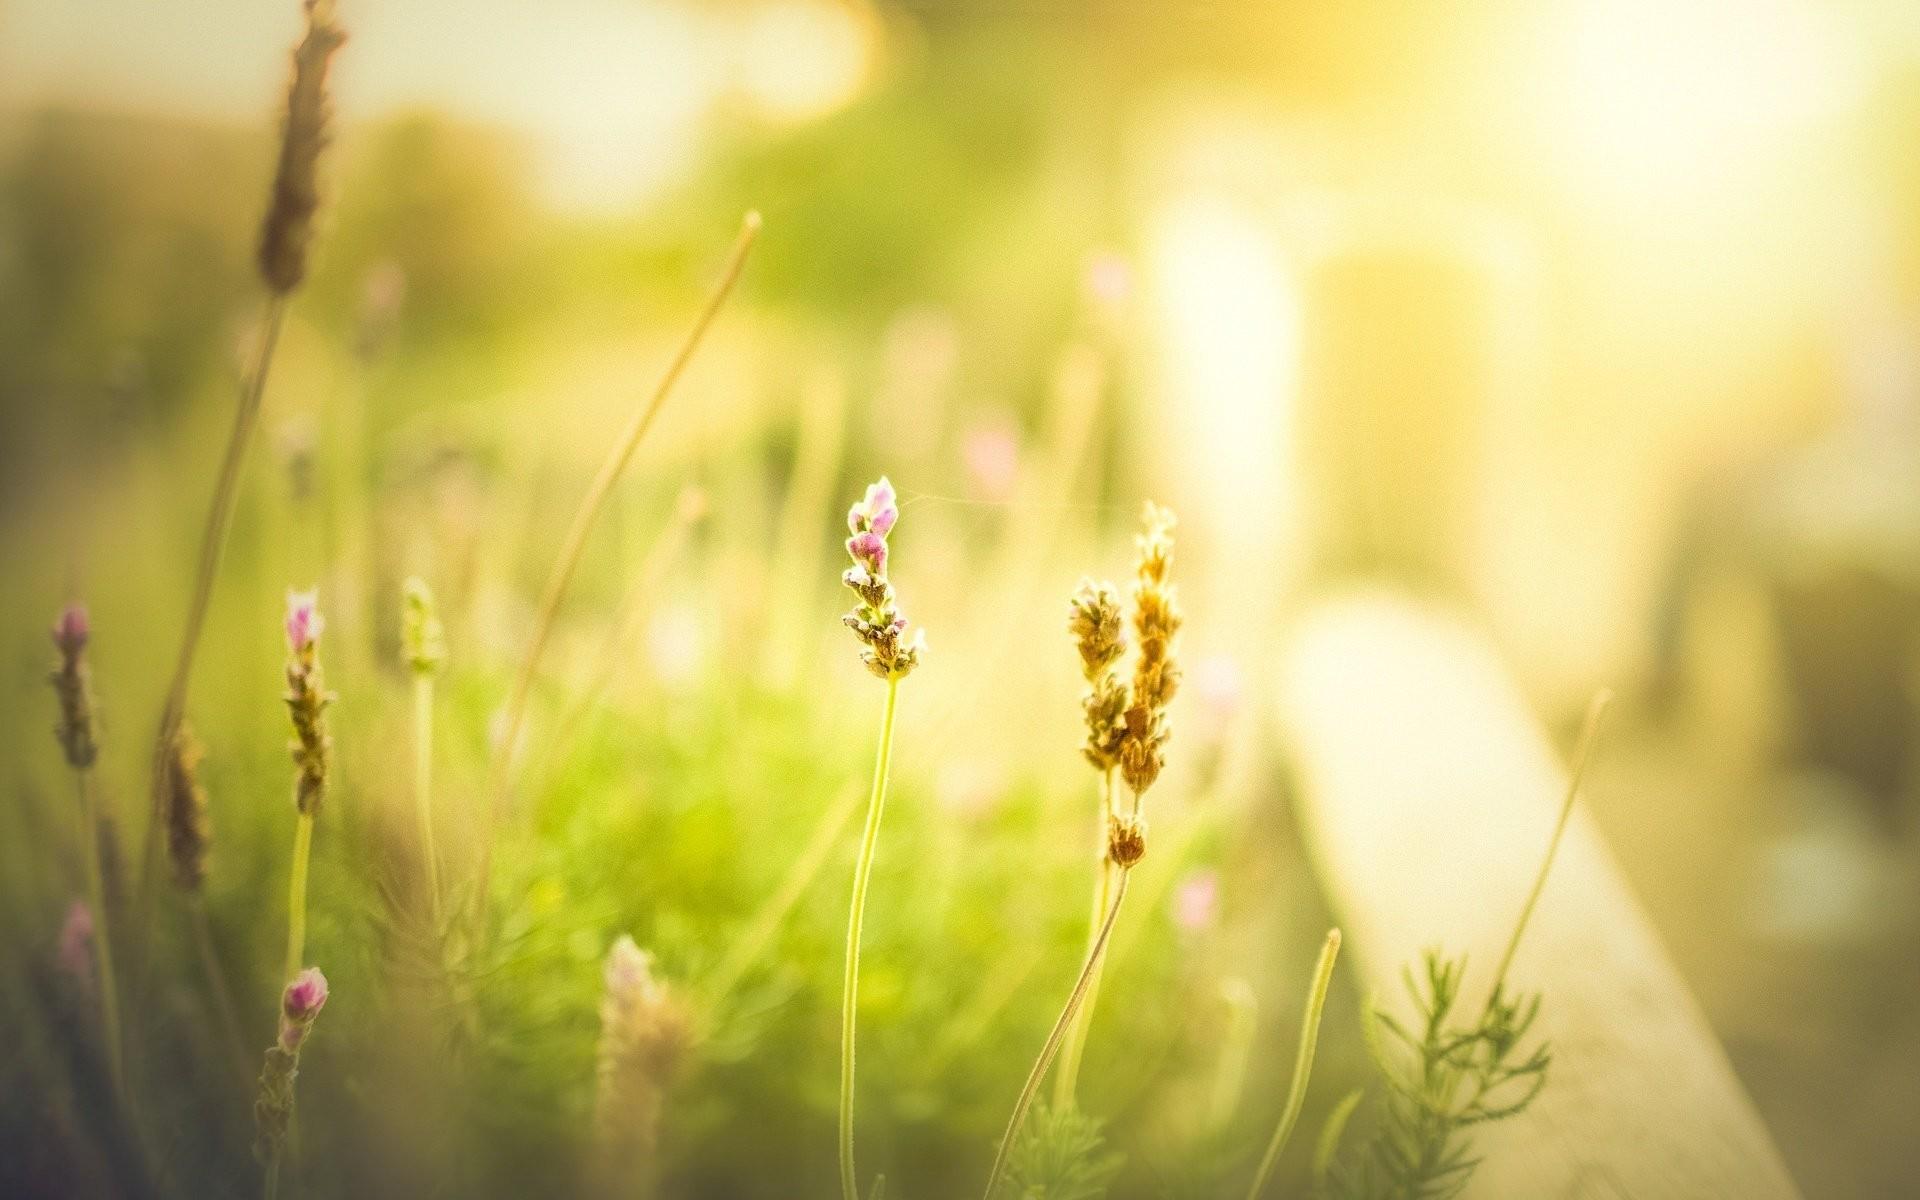 flower green grass meadow the field blur day morning summer spring flower  greens background wallpaper widescreen. Your screen: 1024×1024